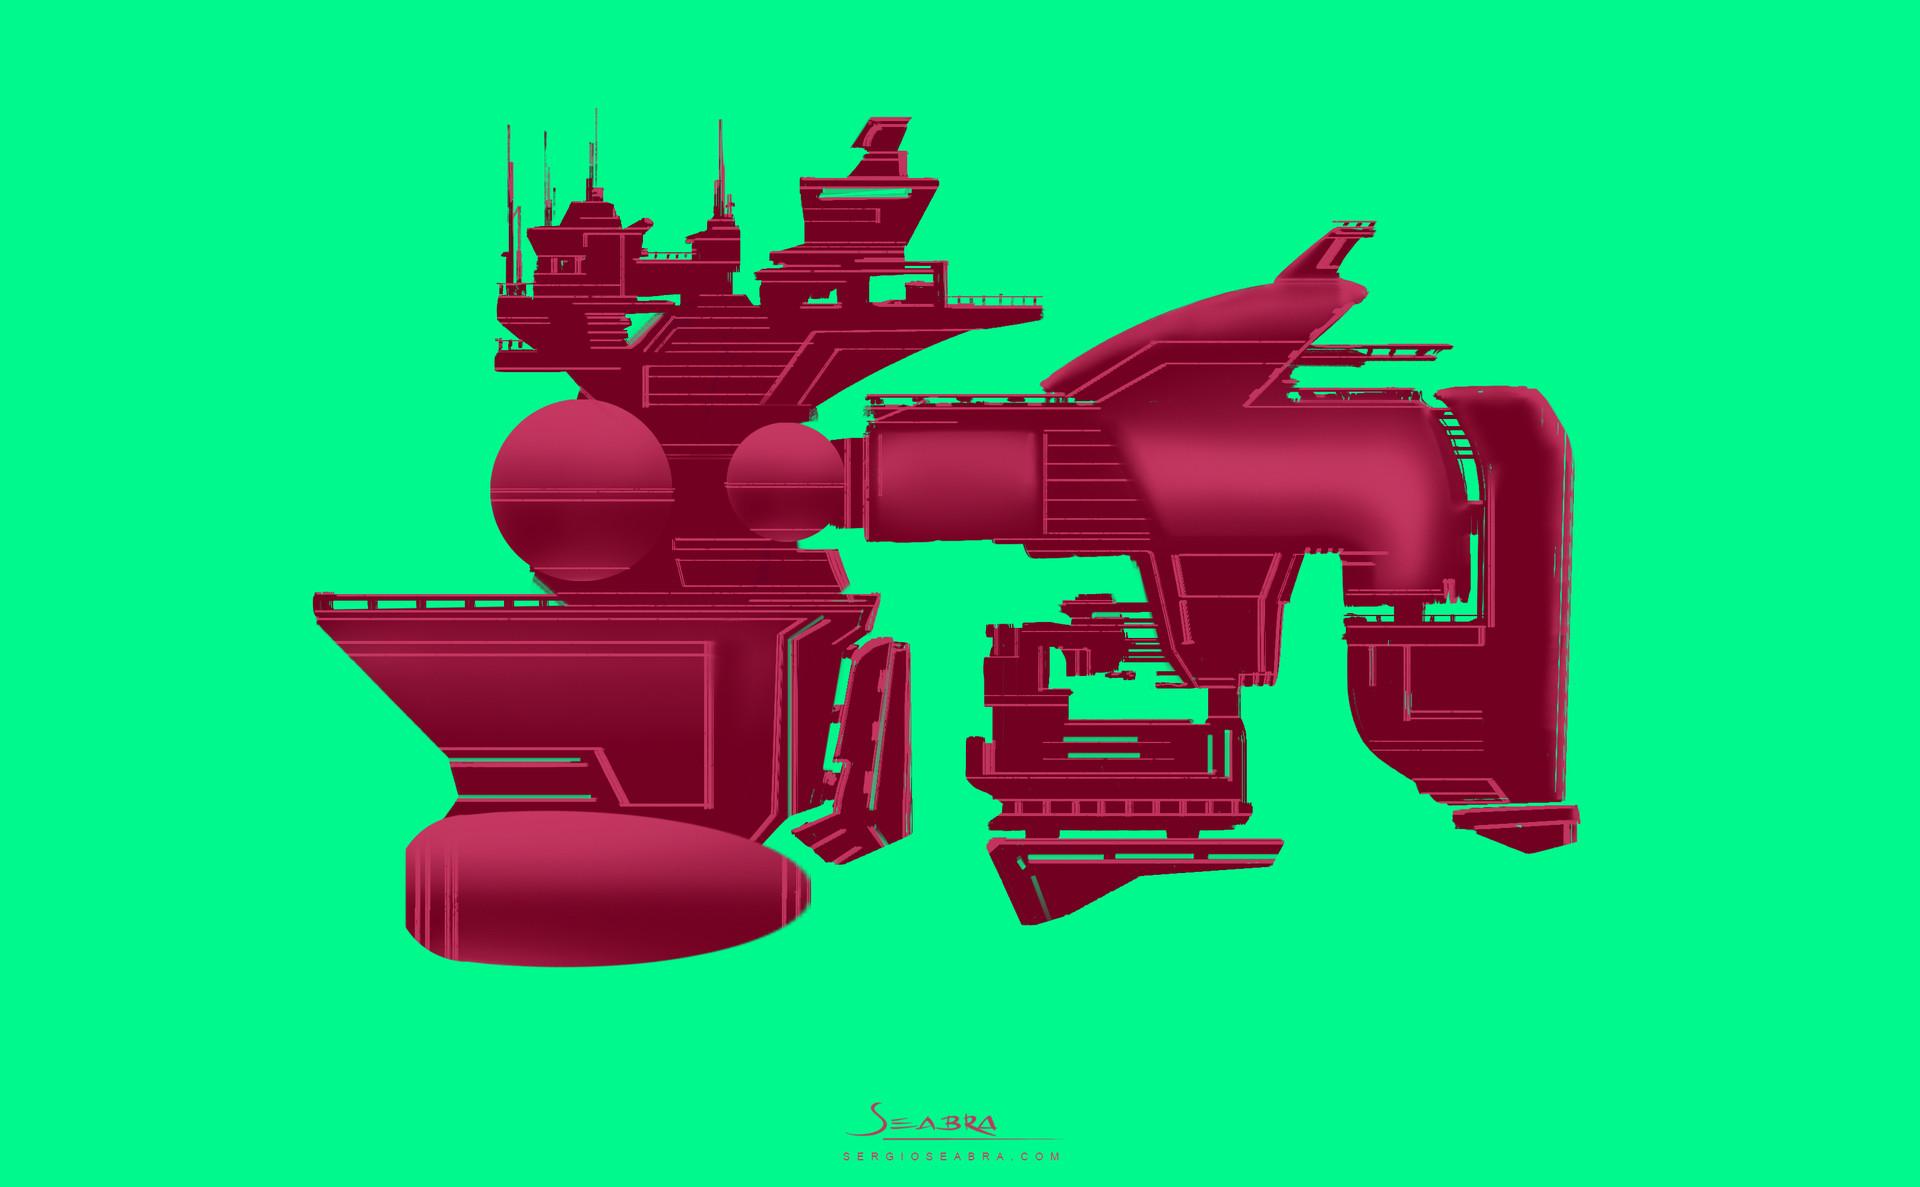 Sergio seabra 2016 spaceship expl ss4